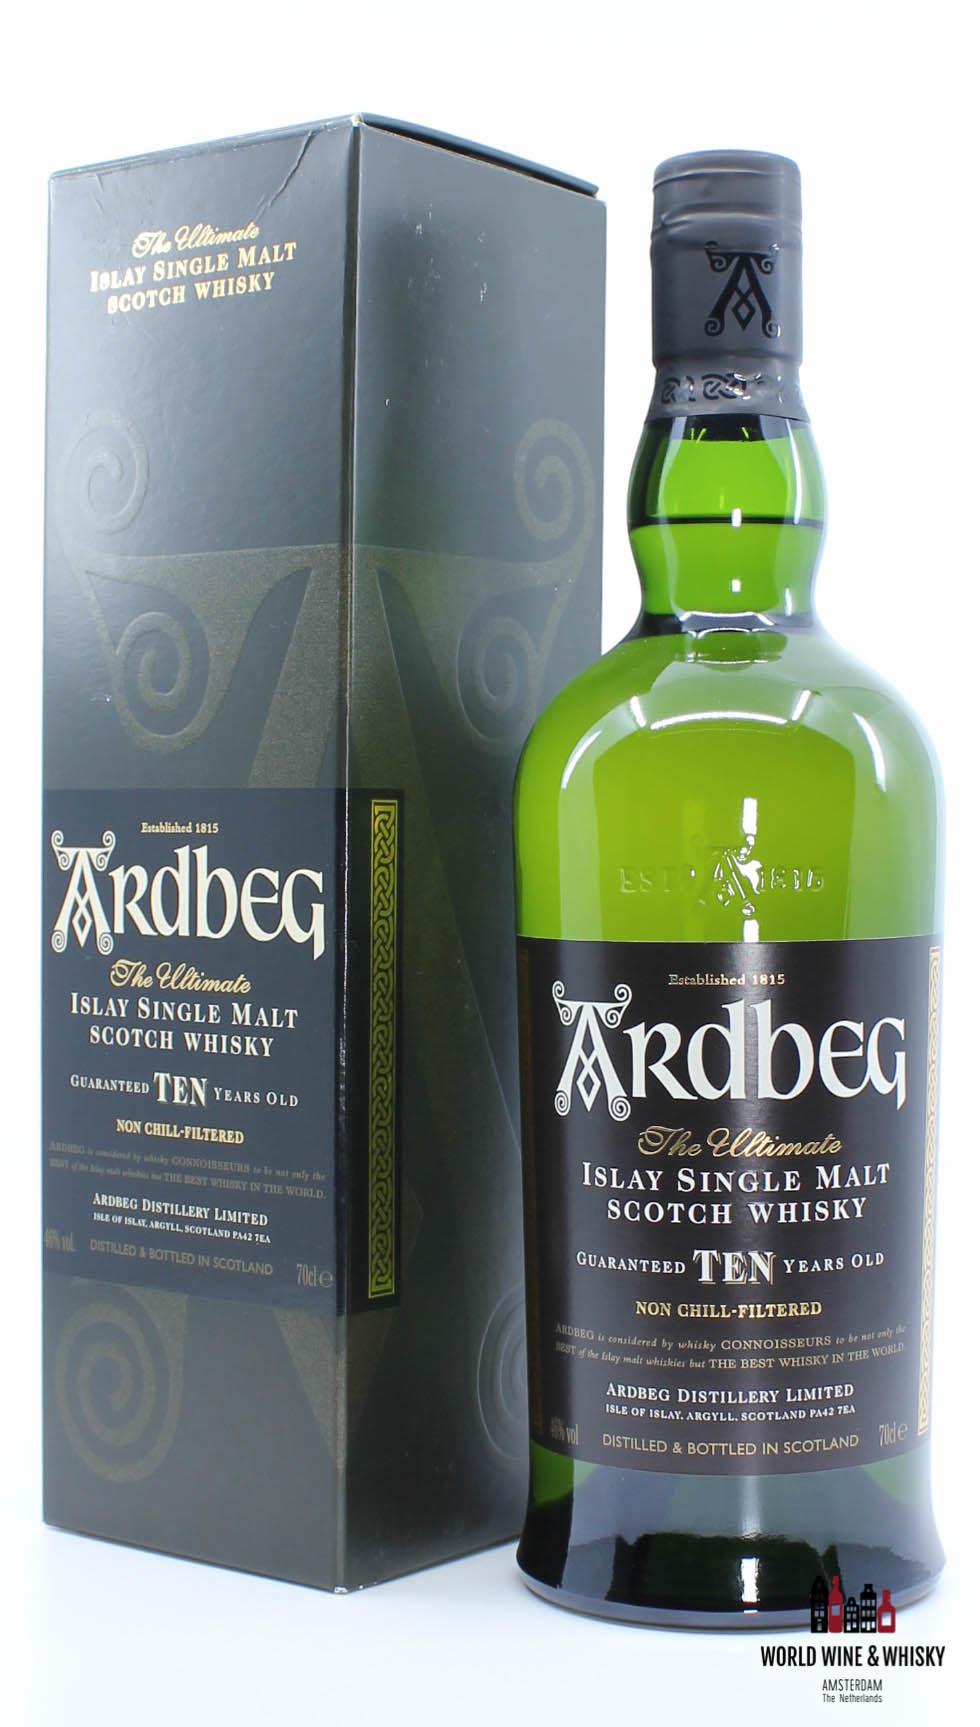 Ardbeg Ardbeg Ten - 10 Years Old 2015 Ardbeg Distillery Limited 46%